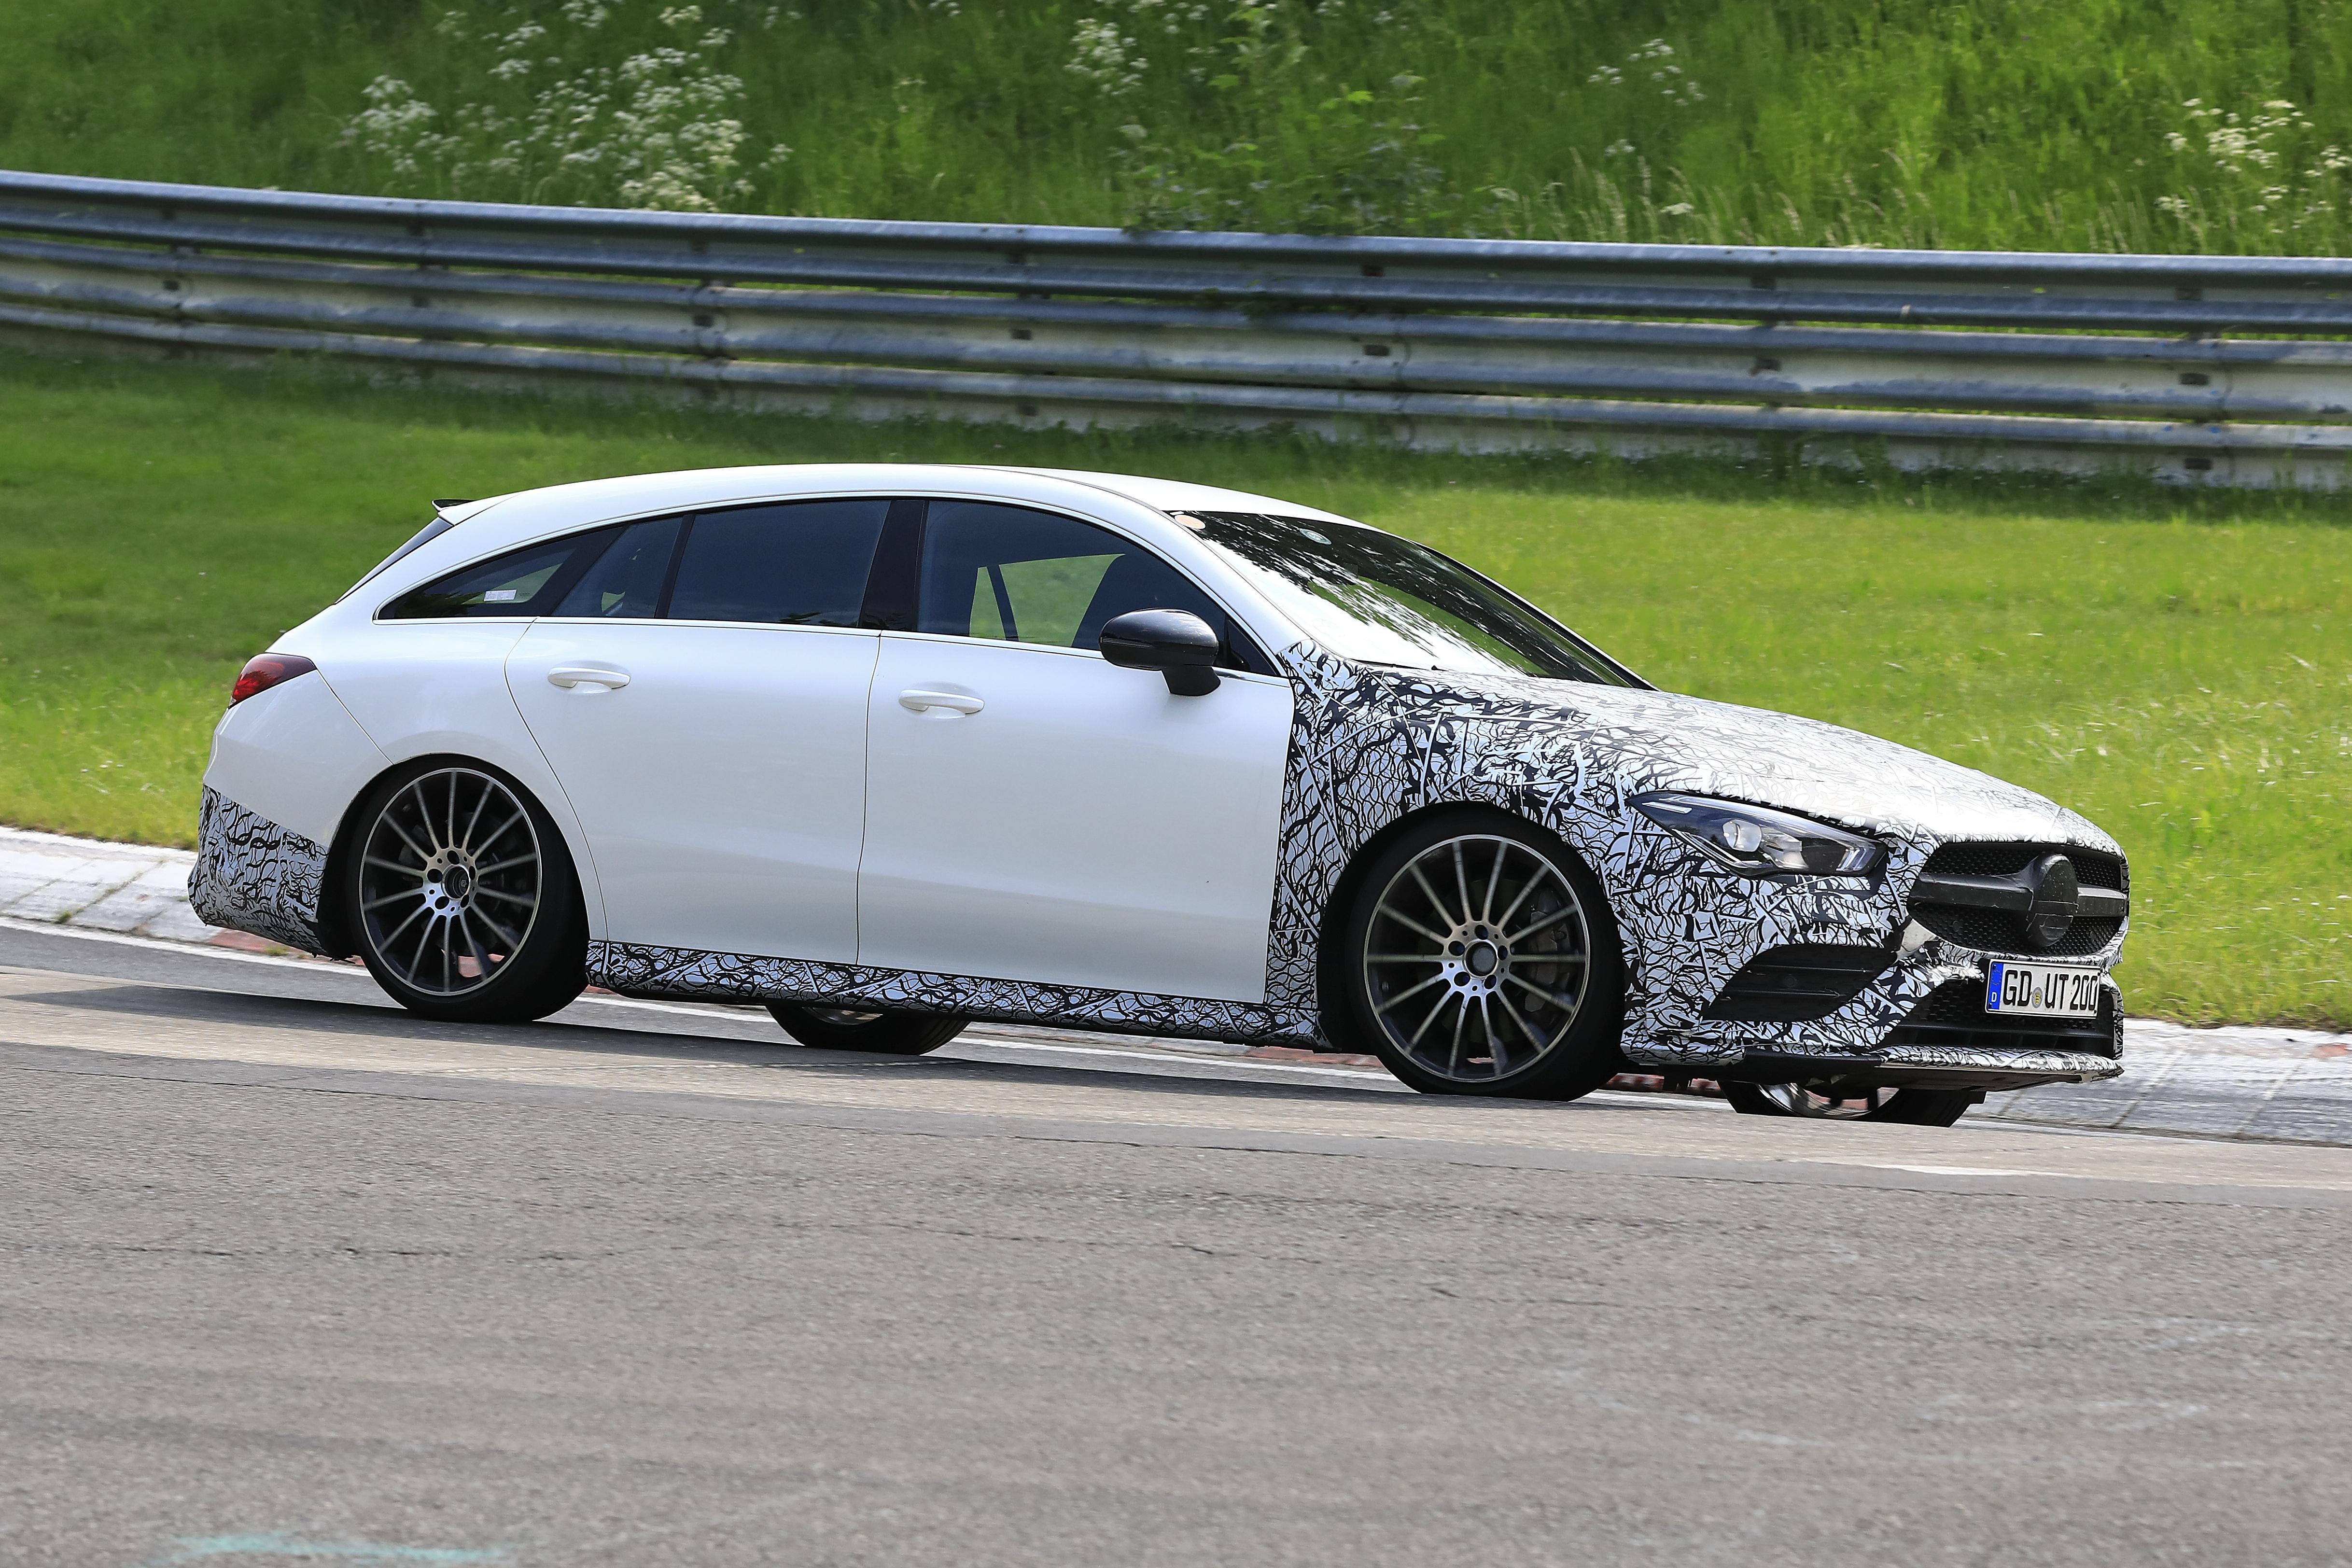 Mercedes CLA AMG Shooting Brake 2020